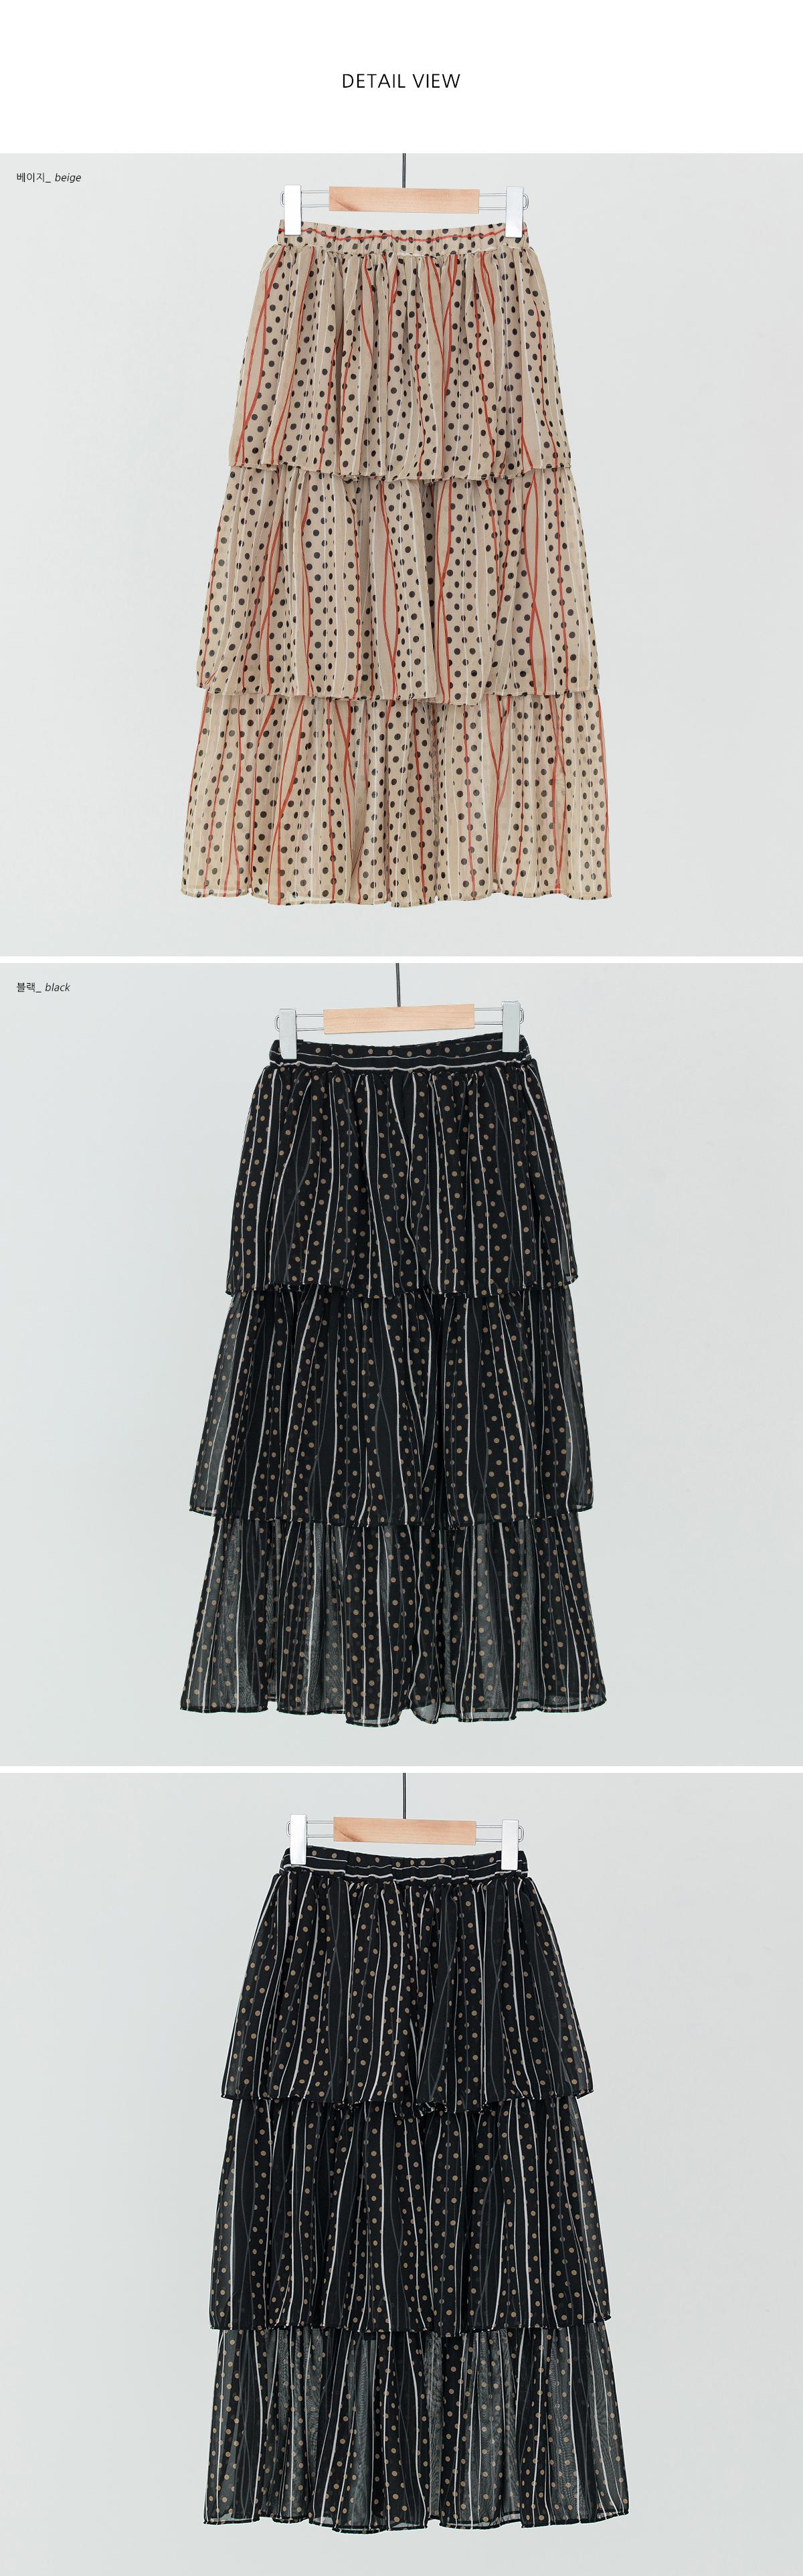 dot pattern tiered skirt